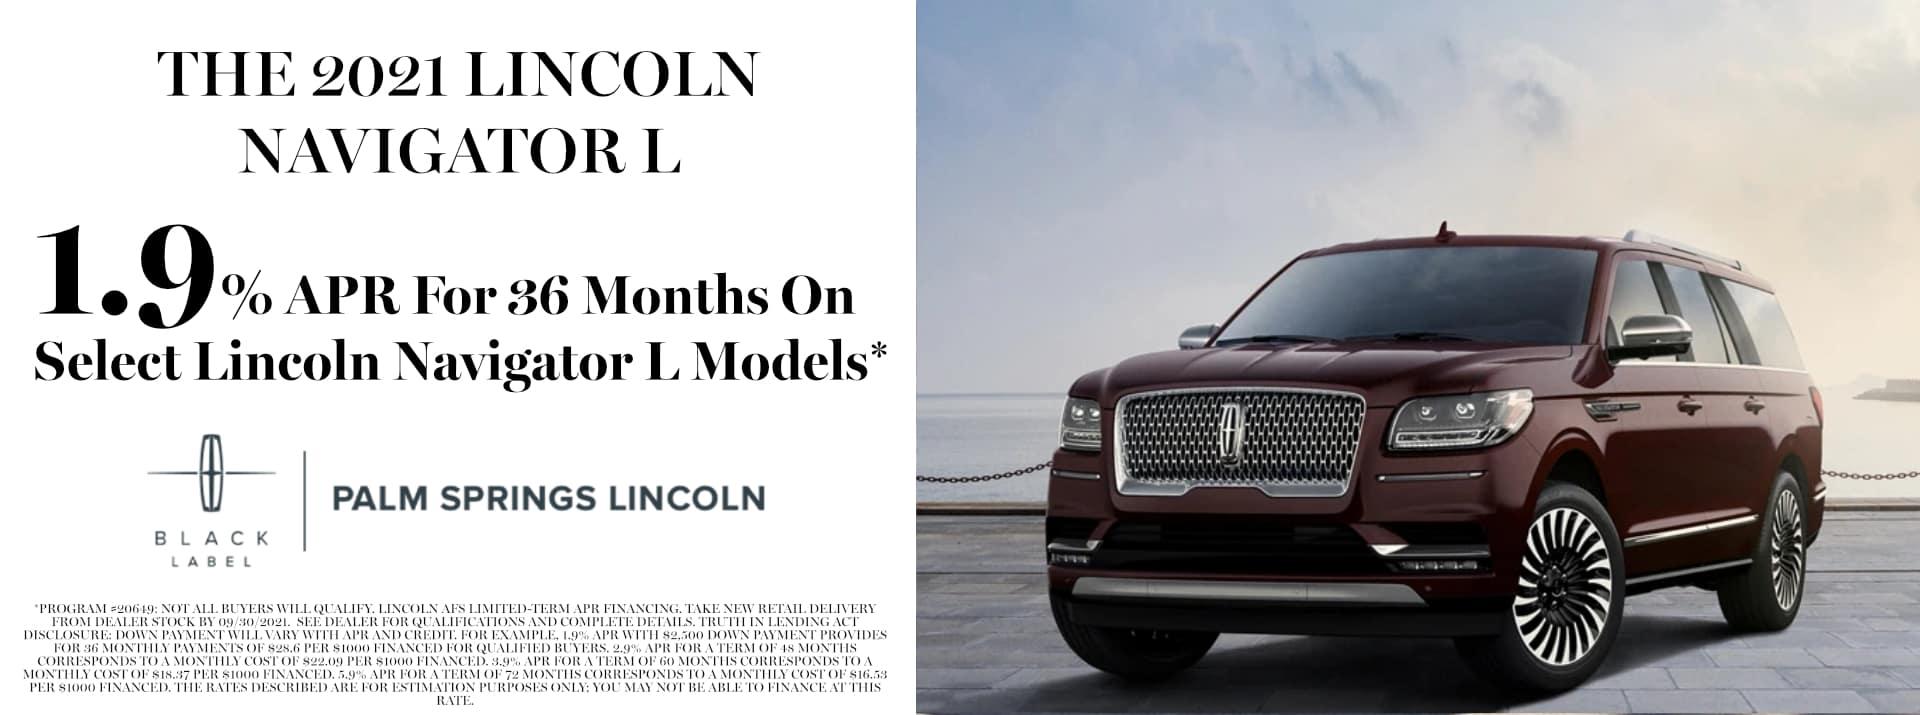 July_2021_Lincoln_Navigator_1920x715